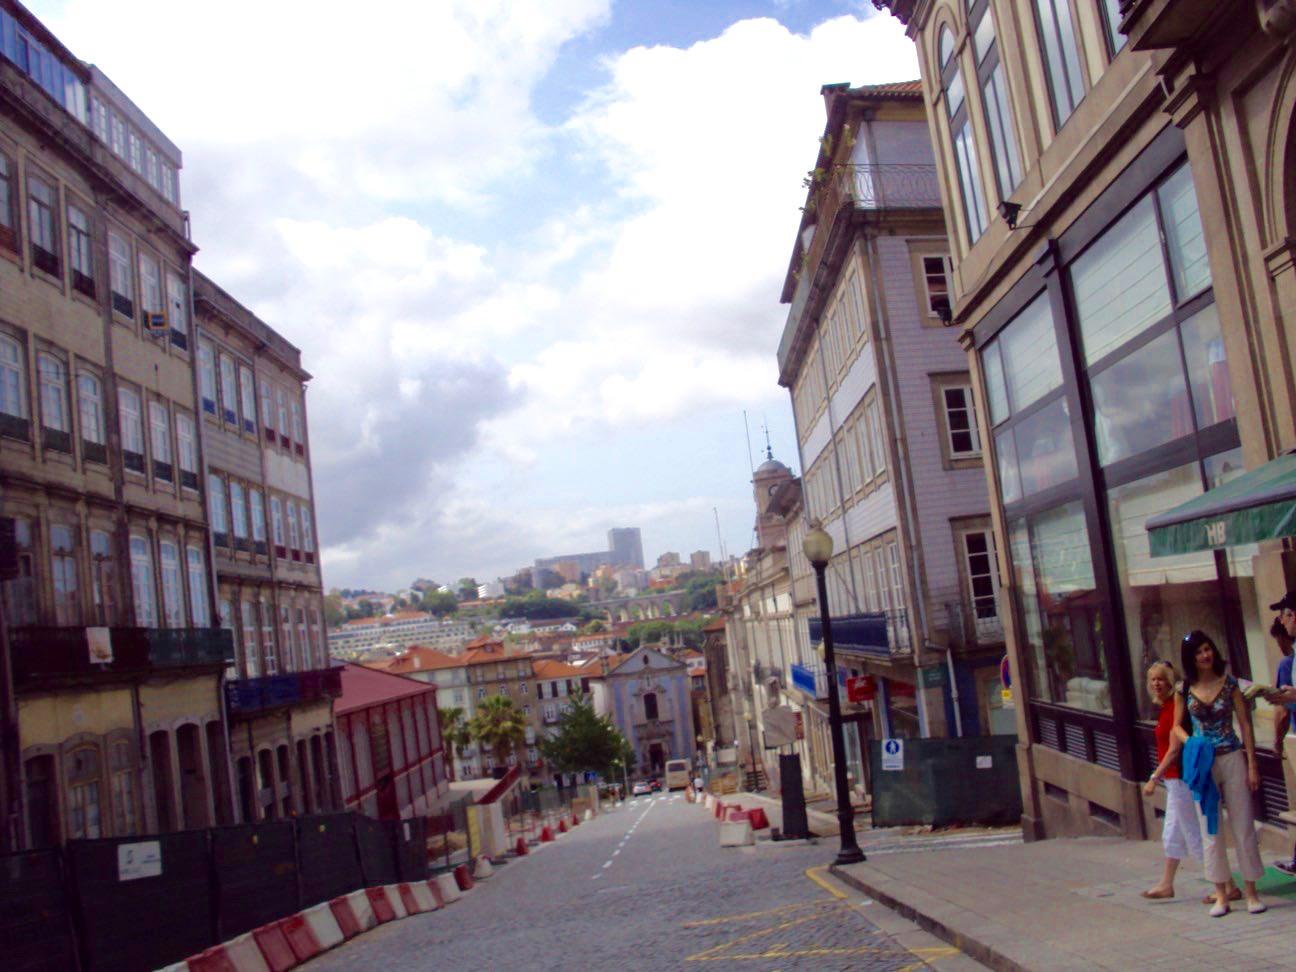 Străzile din Ribeira, Porto